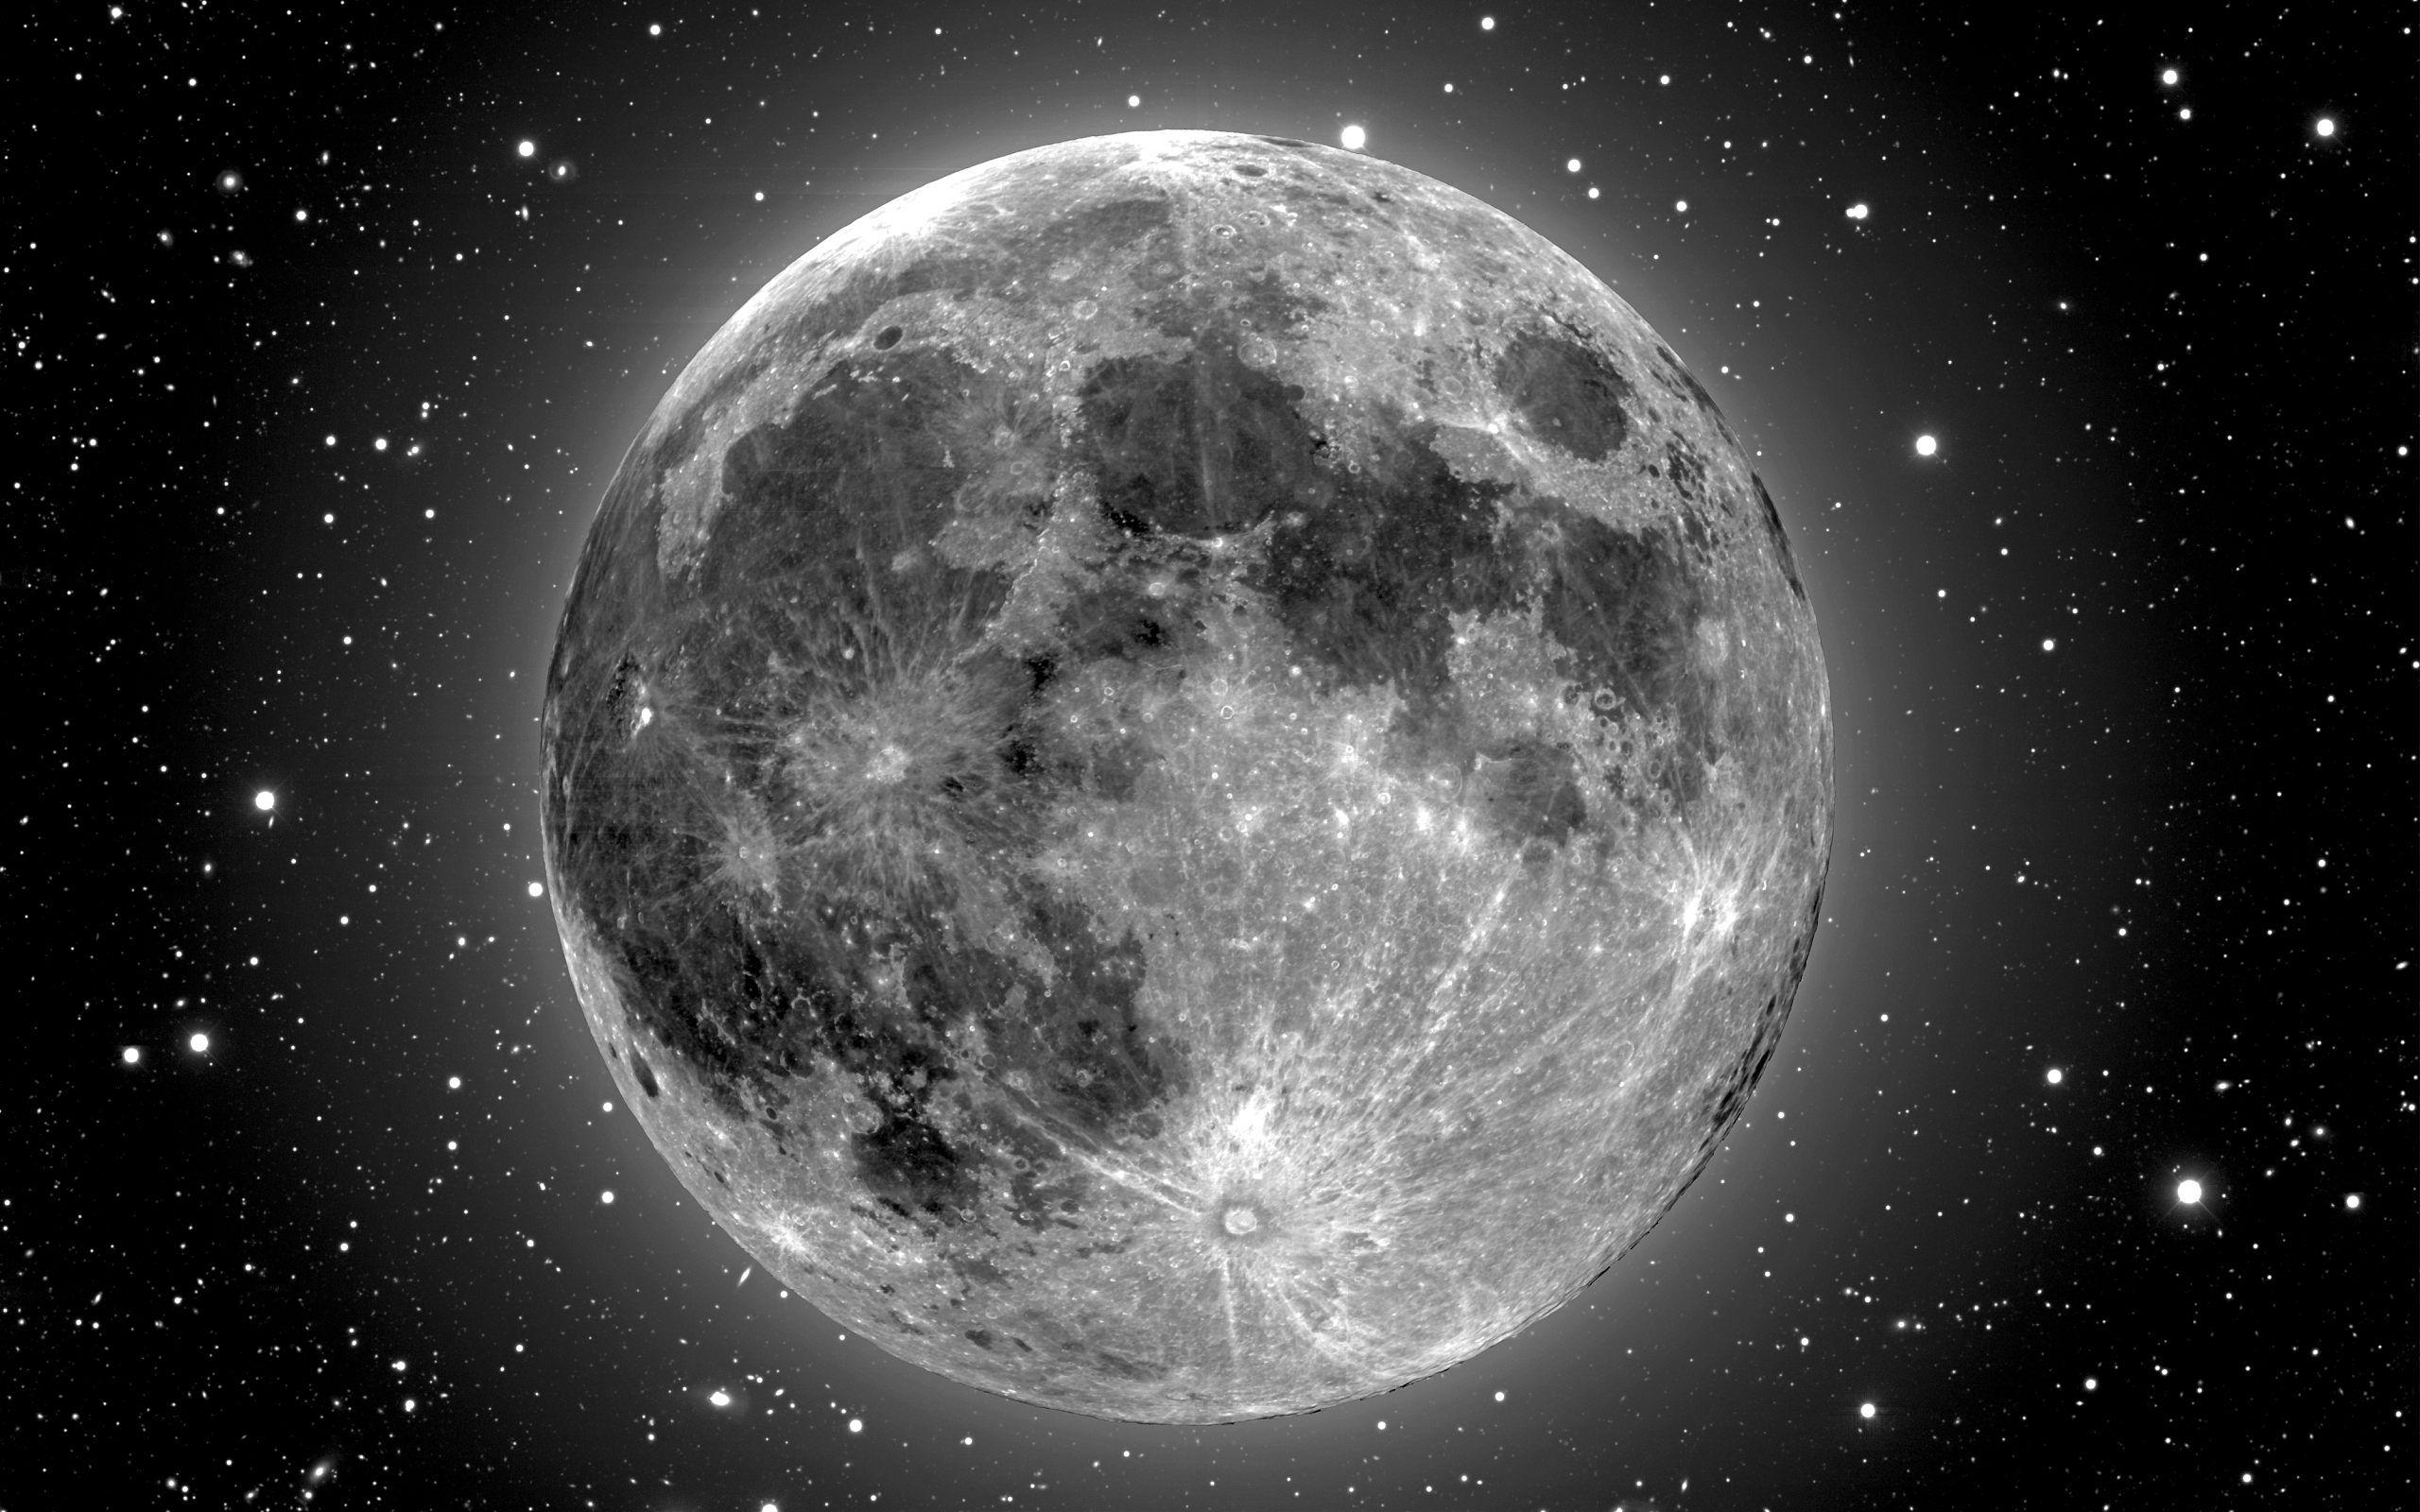 Black Moon Wallpapers Hd